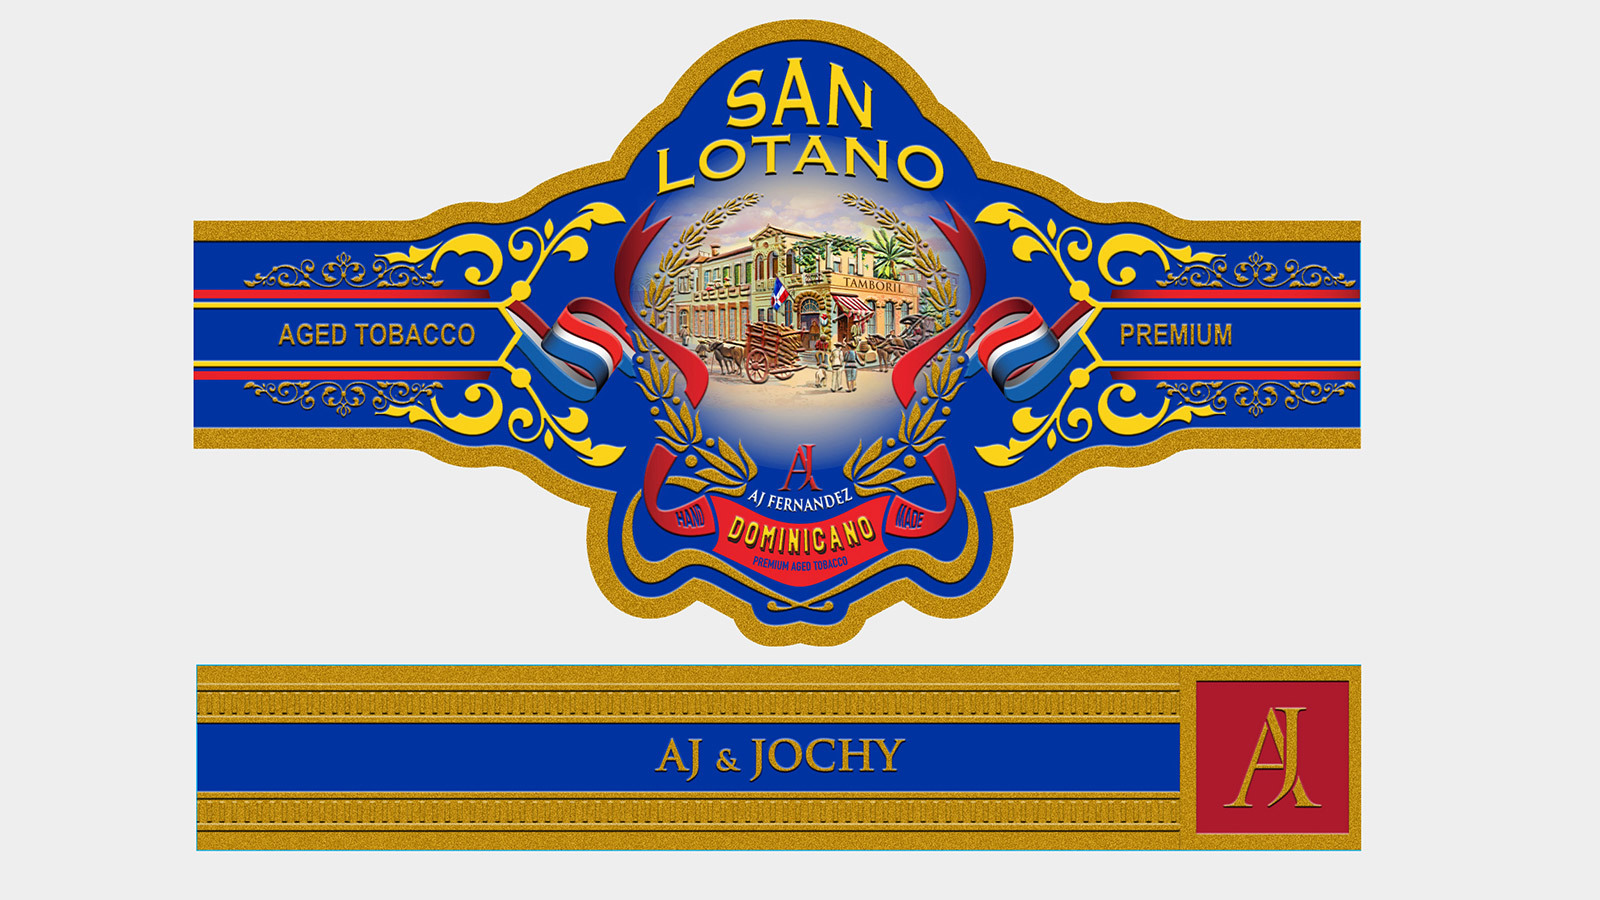 san-lotano-dominicano-1600.jpg